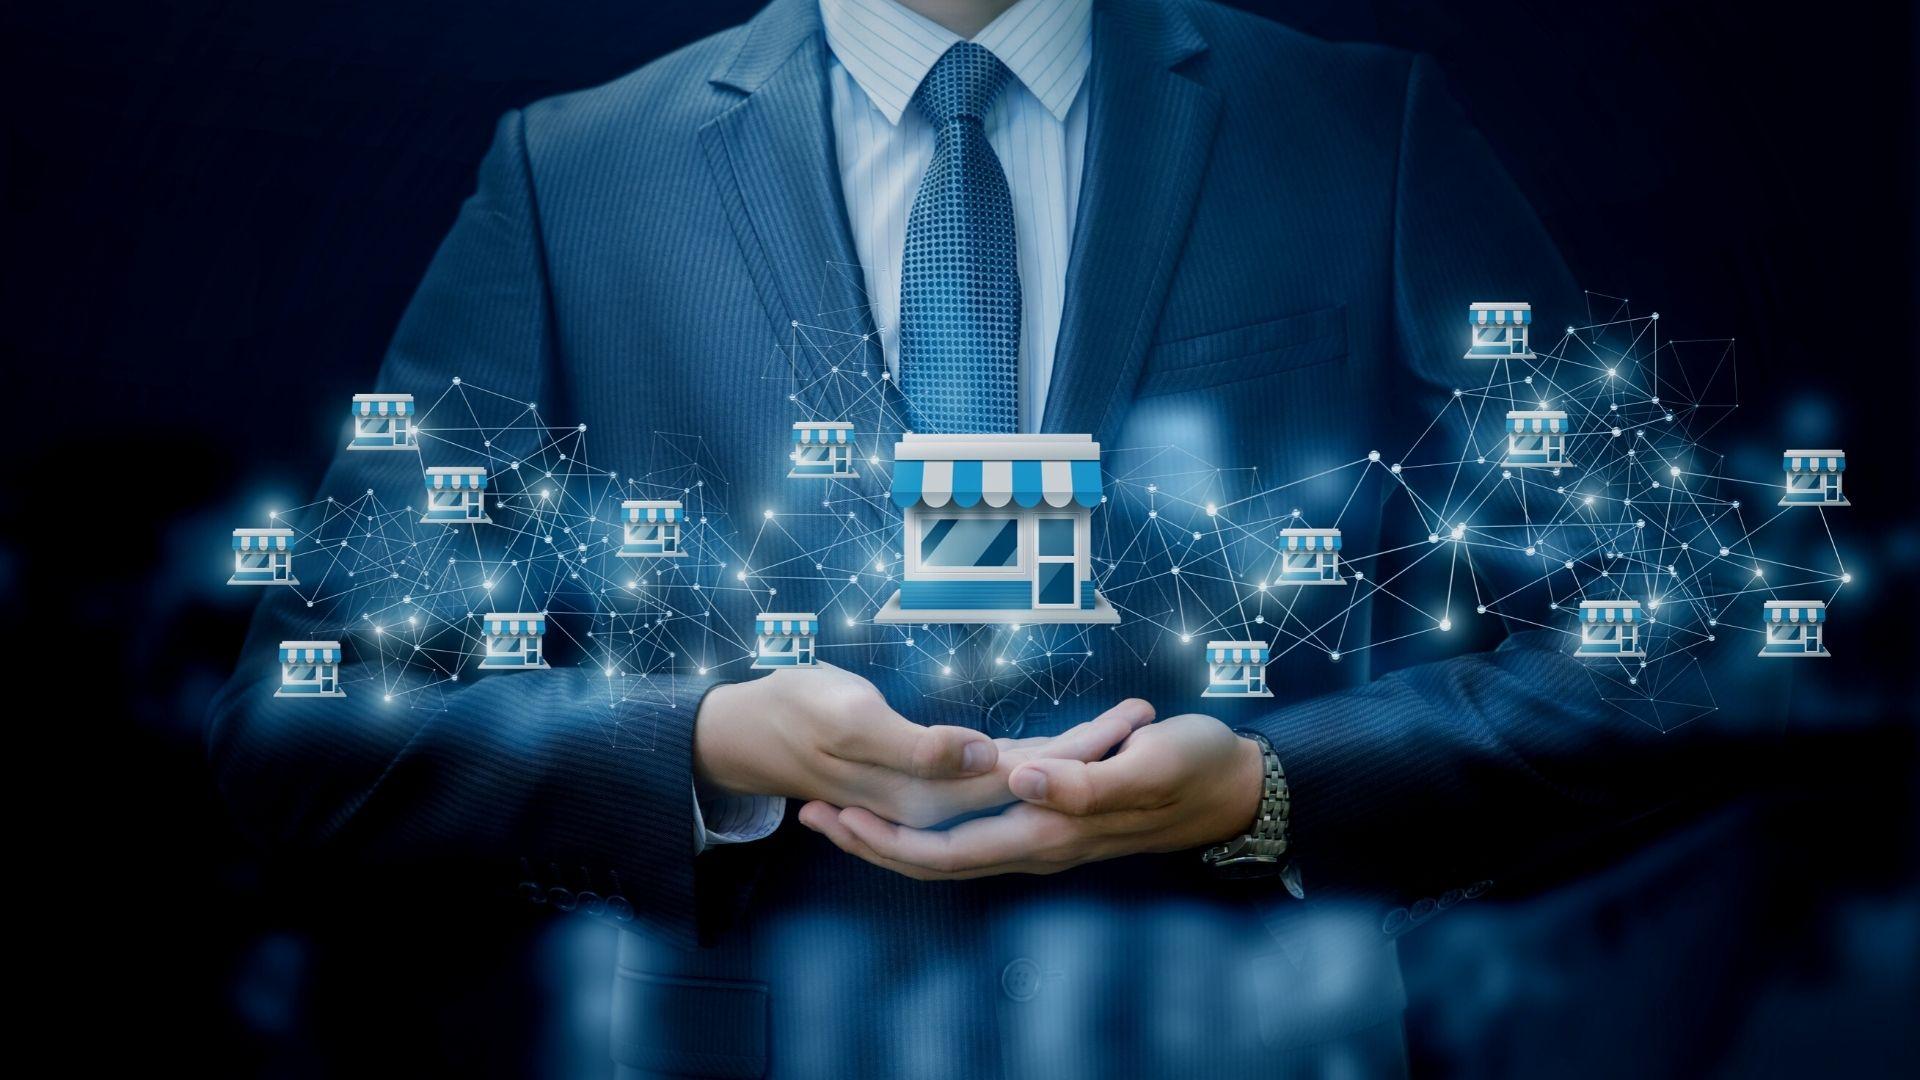 Read more about the article International Certificate in Franchise Management – Διεθνής Πιστοποίηση Διοίκησης Συστημάτων Δικαιοχρησίας